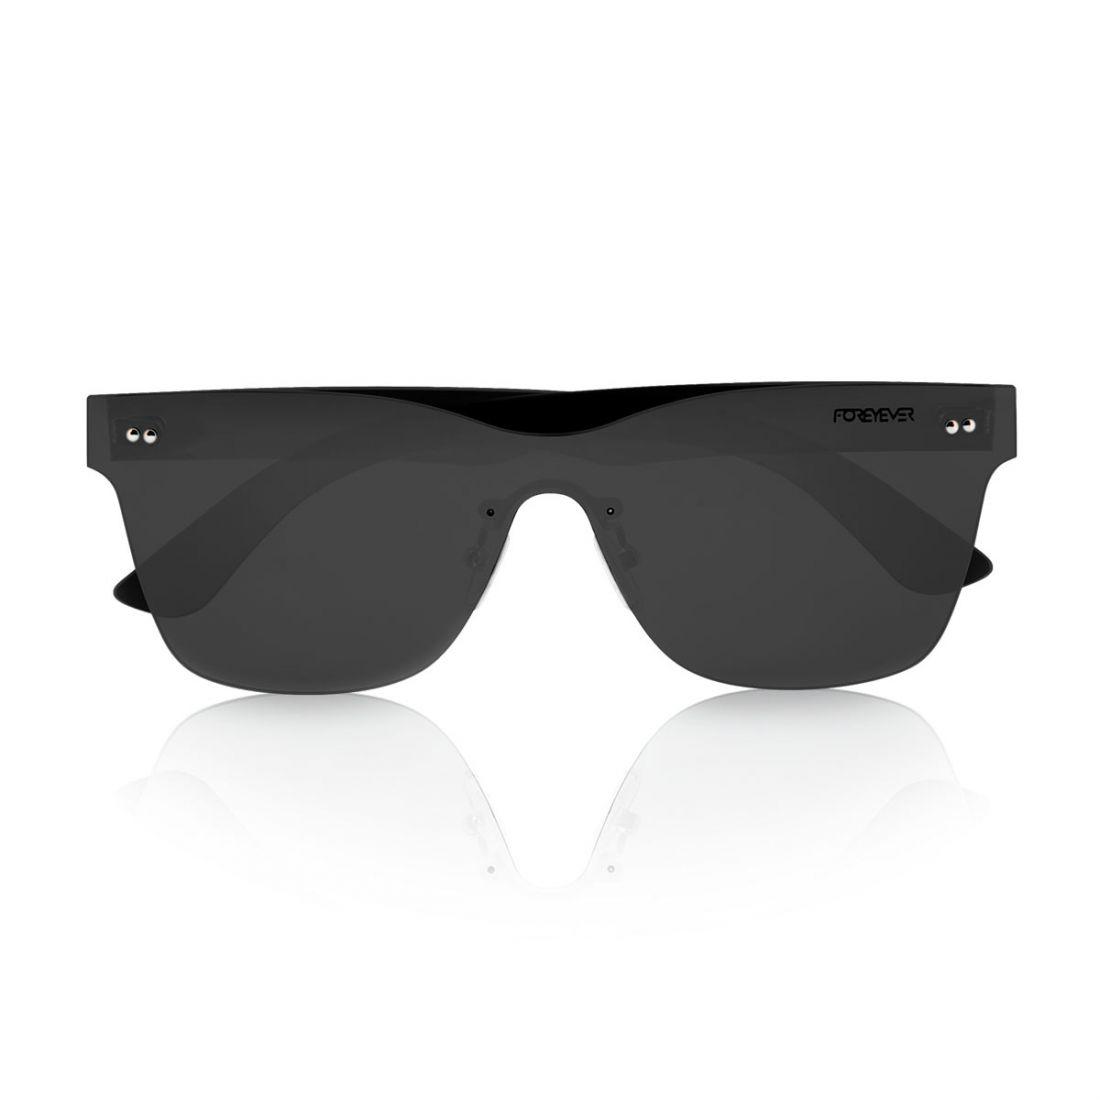 a9ff88ed9dc Spica one piec lens sunglasses with futuristic look for women men